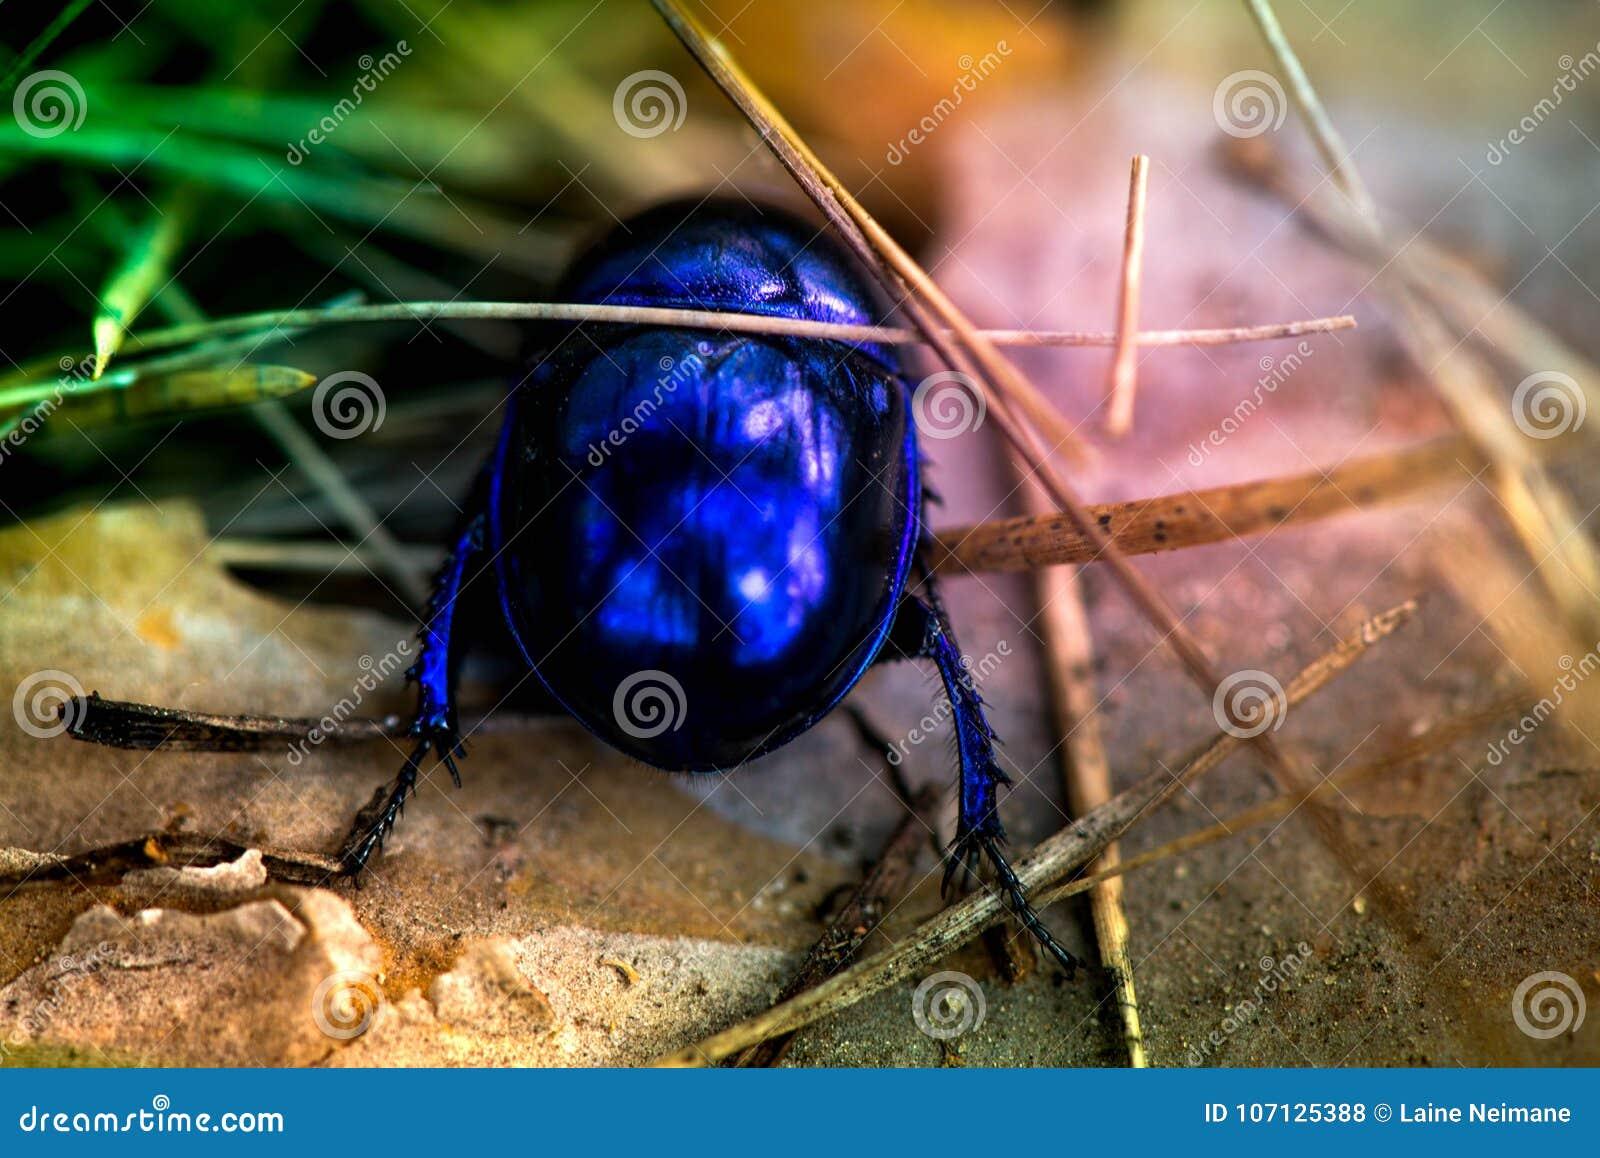 Macro shot of a blue bug